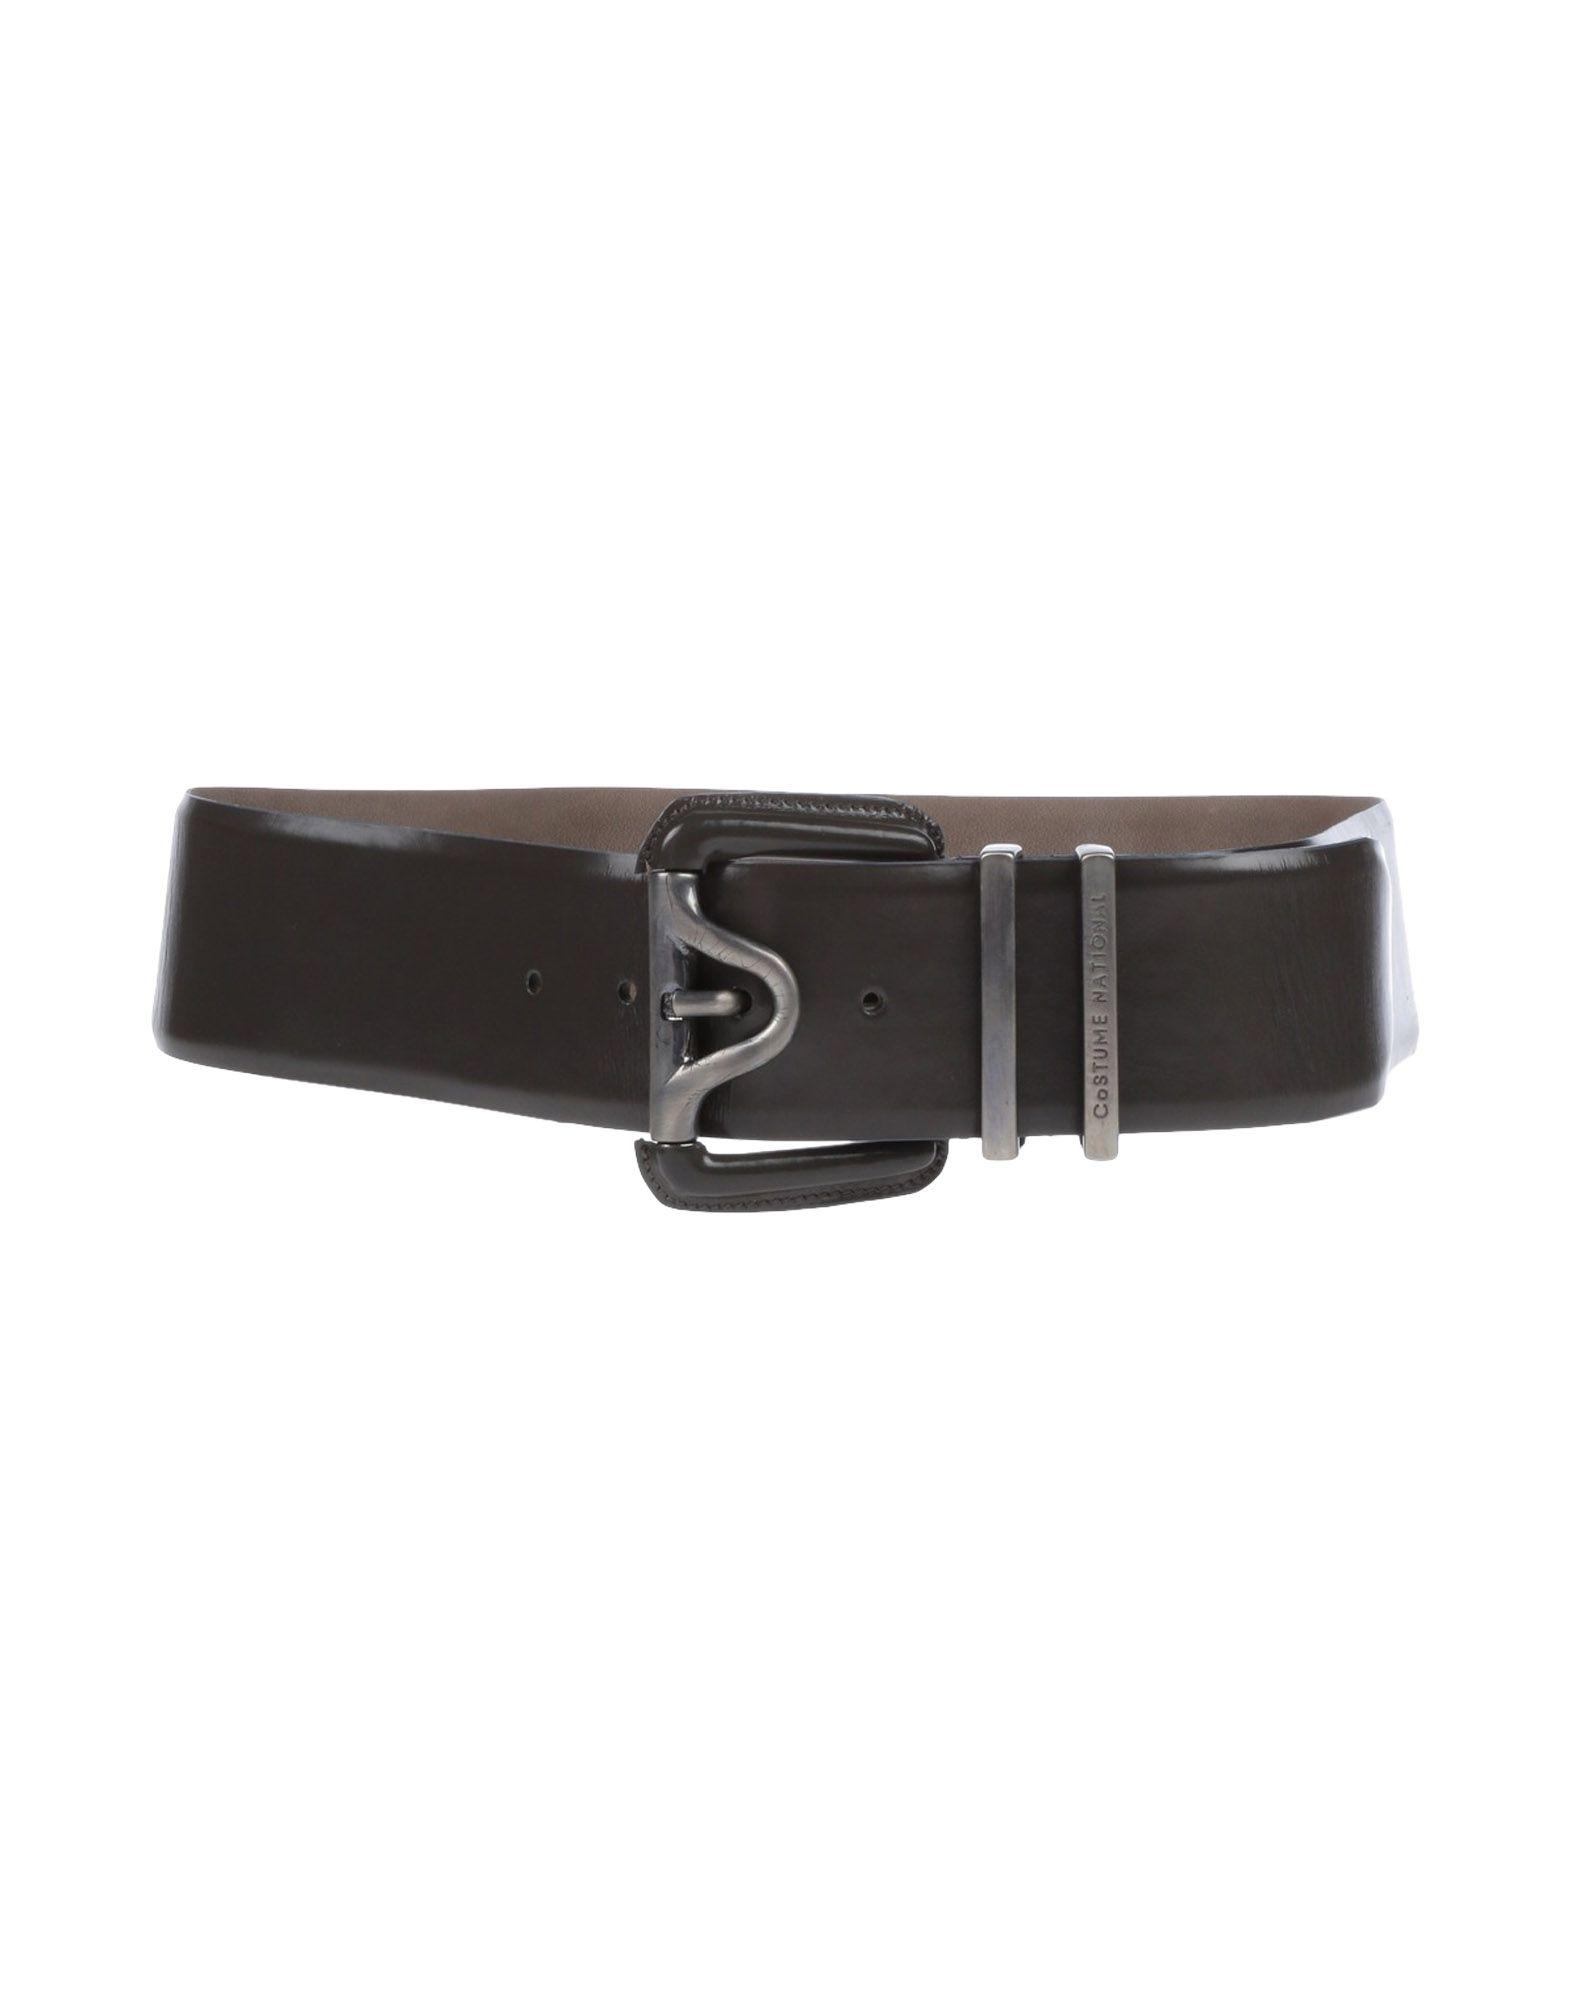 Small Leather Goods - Belts Costume National tnzlpsb7